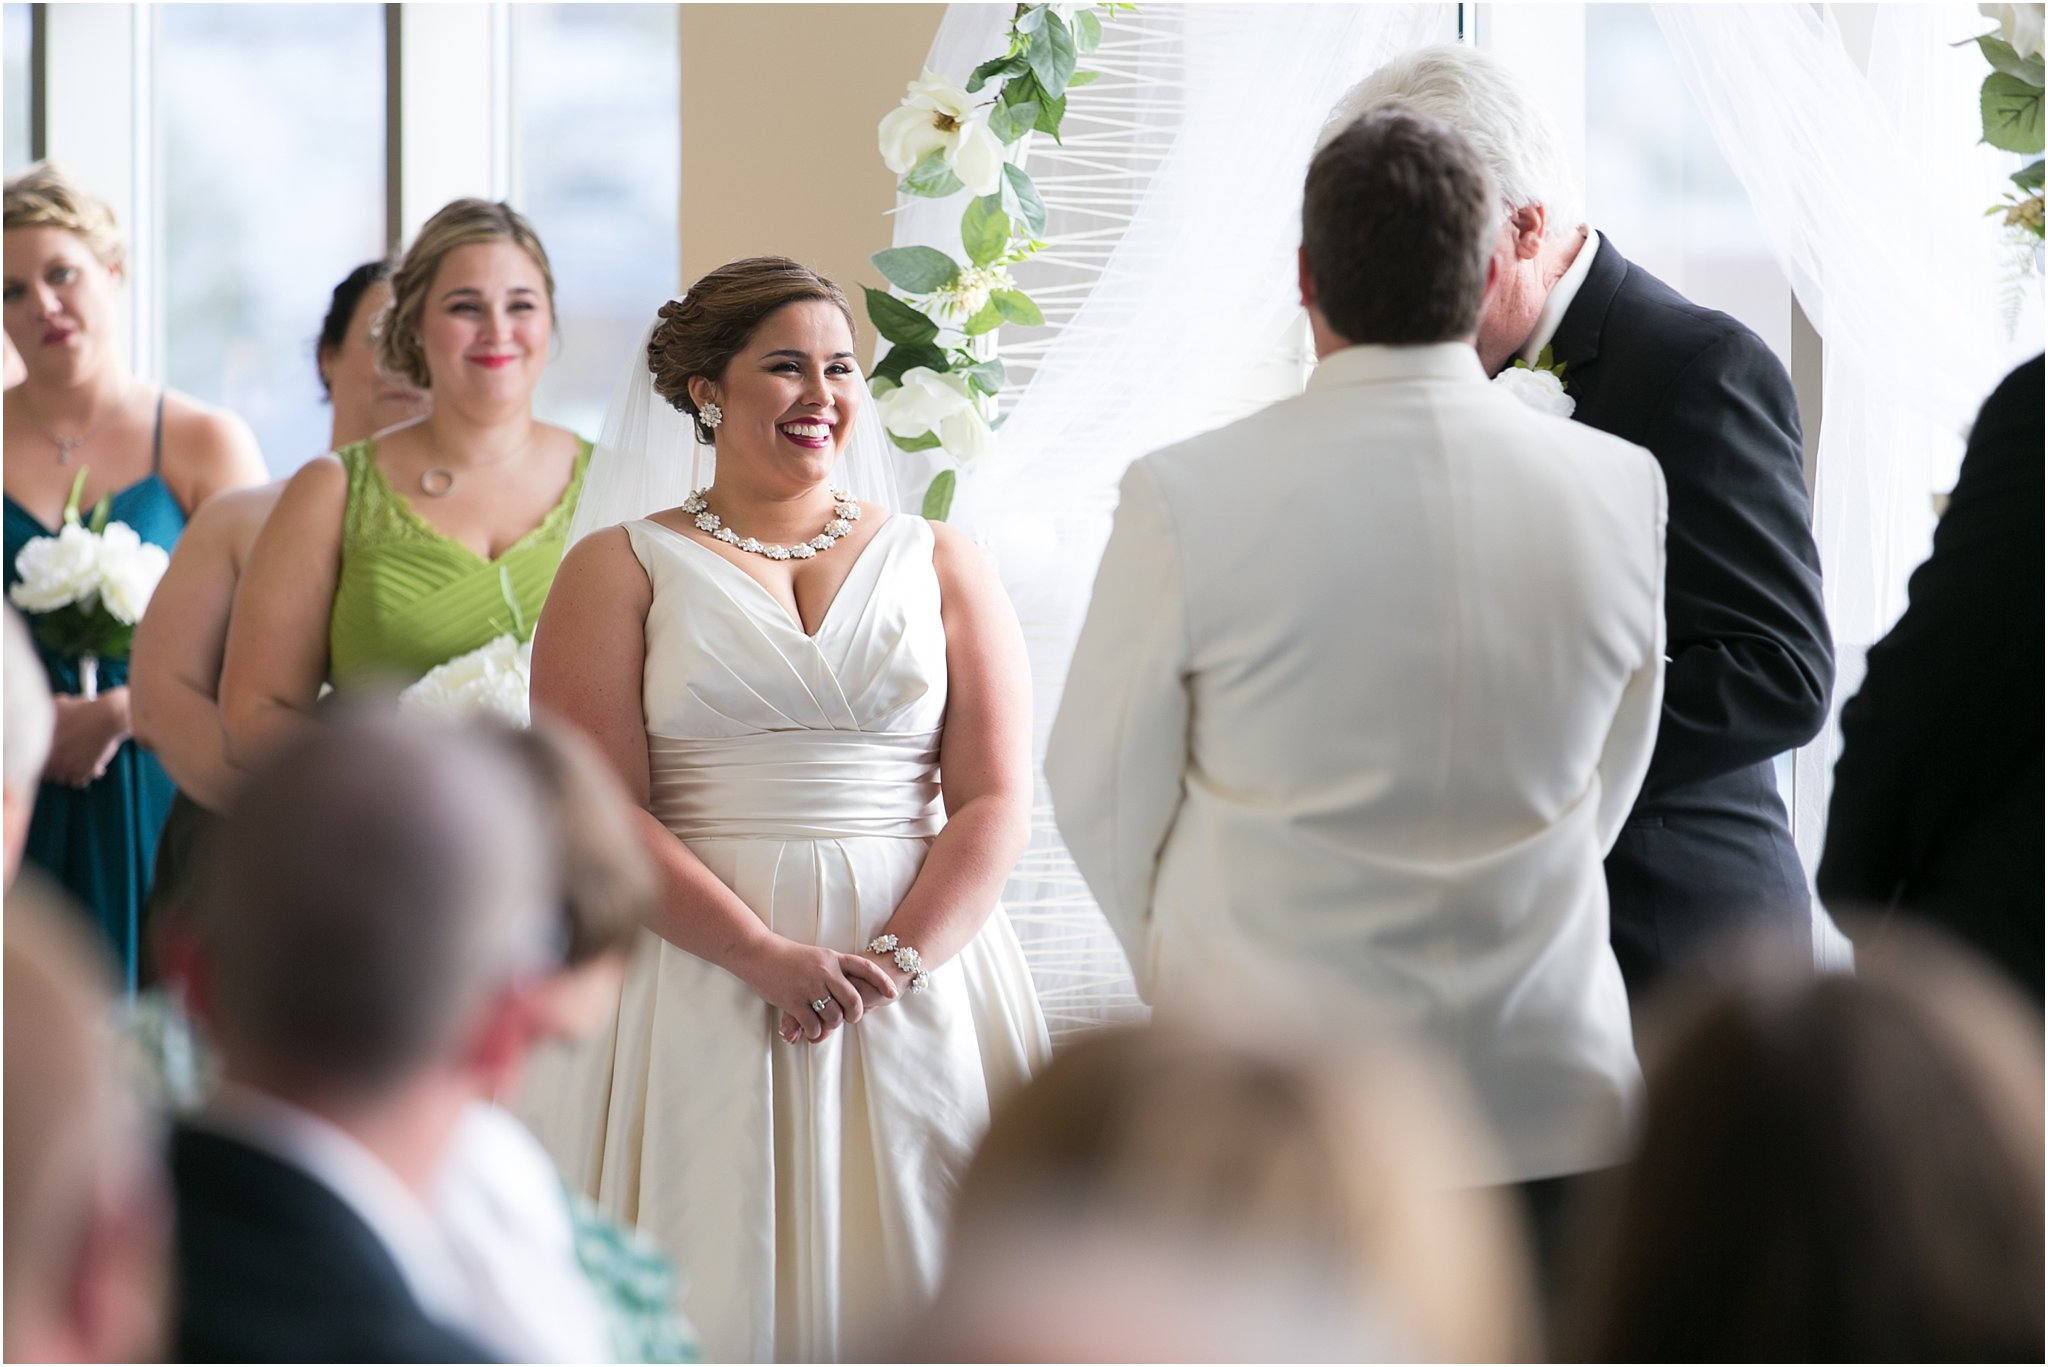 va_jessica_ryan_photography_virginia_wedding_norfolk_harrison_opera_house_norfolk_arts_district_portraits_3783